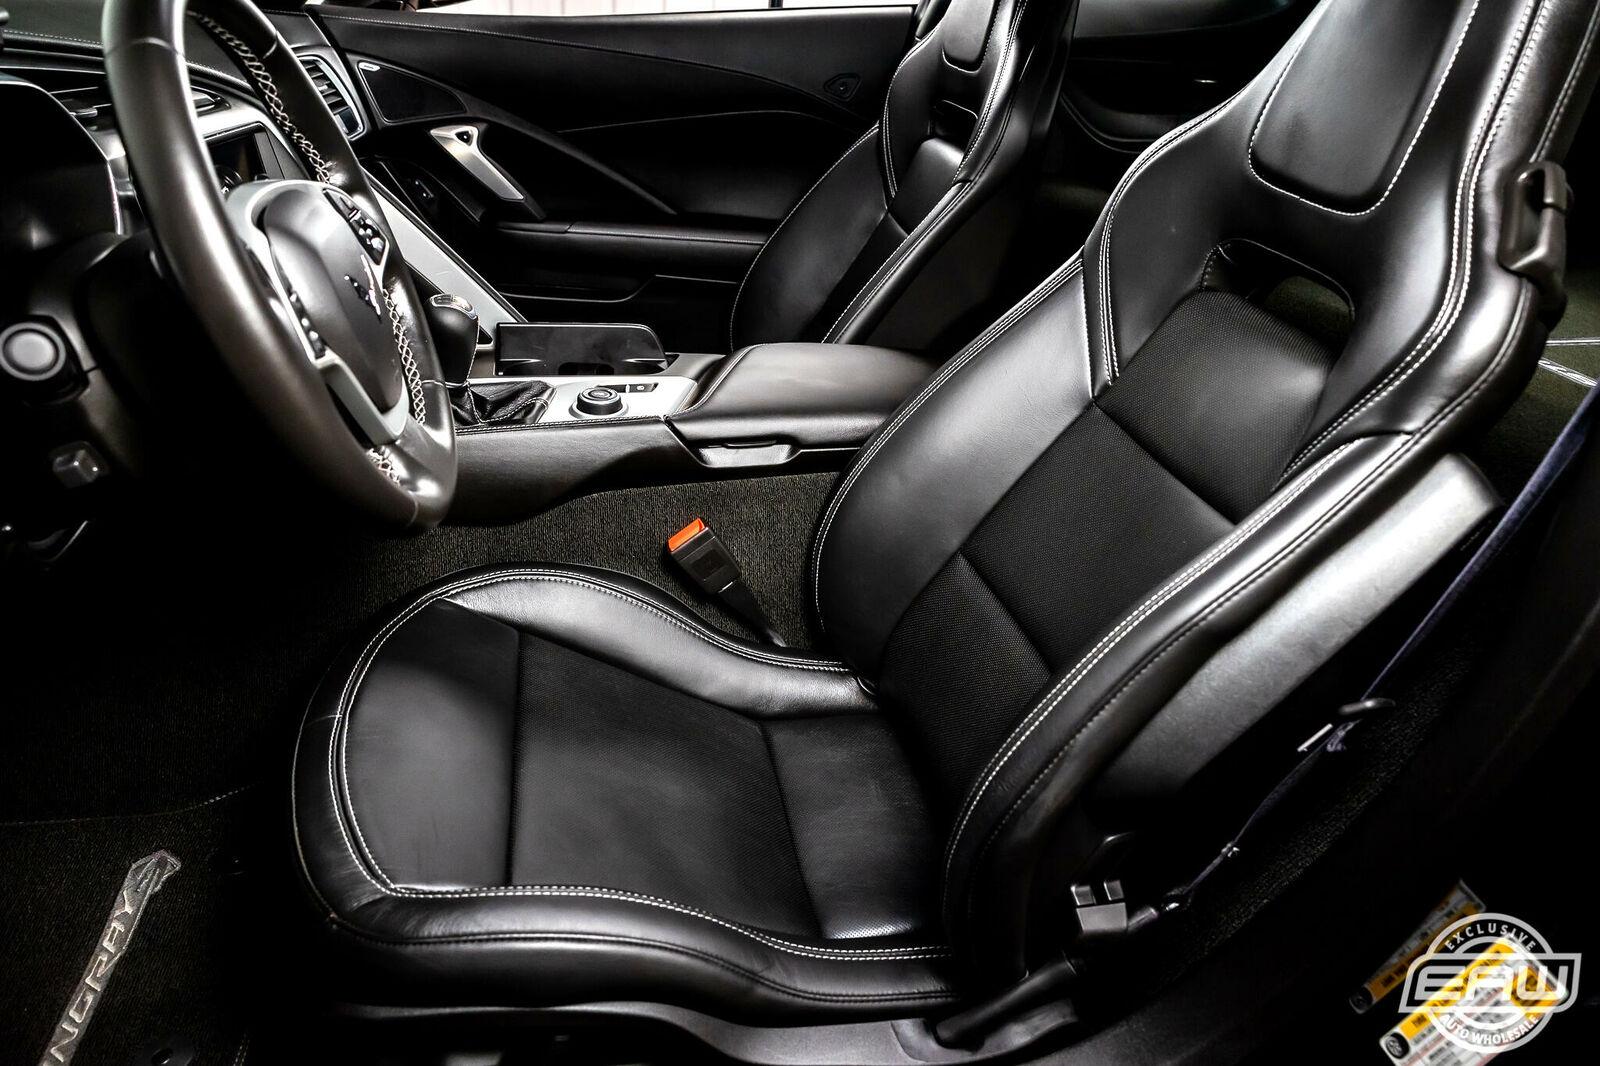 2014 Black Chevrolet Corvette Coupe 1LT | C7 Corvette Photo 5